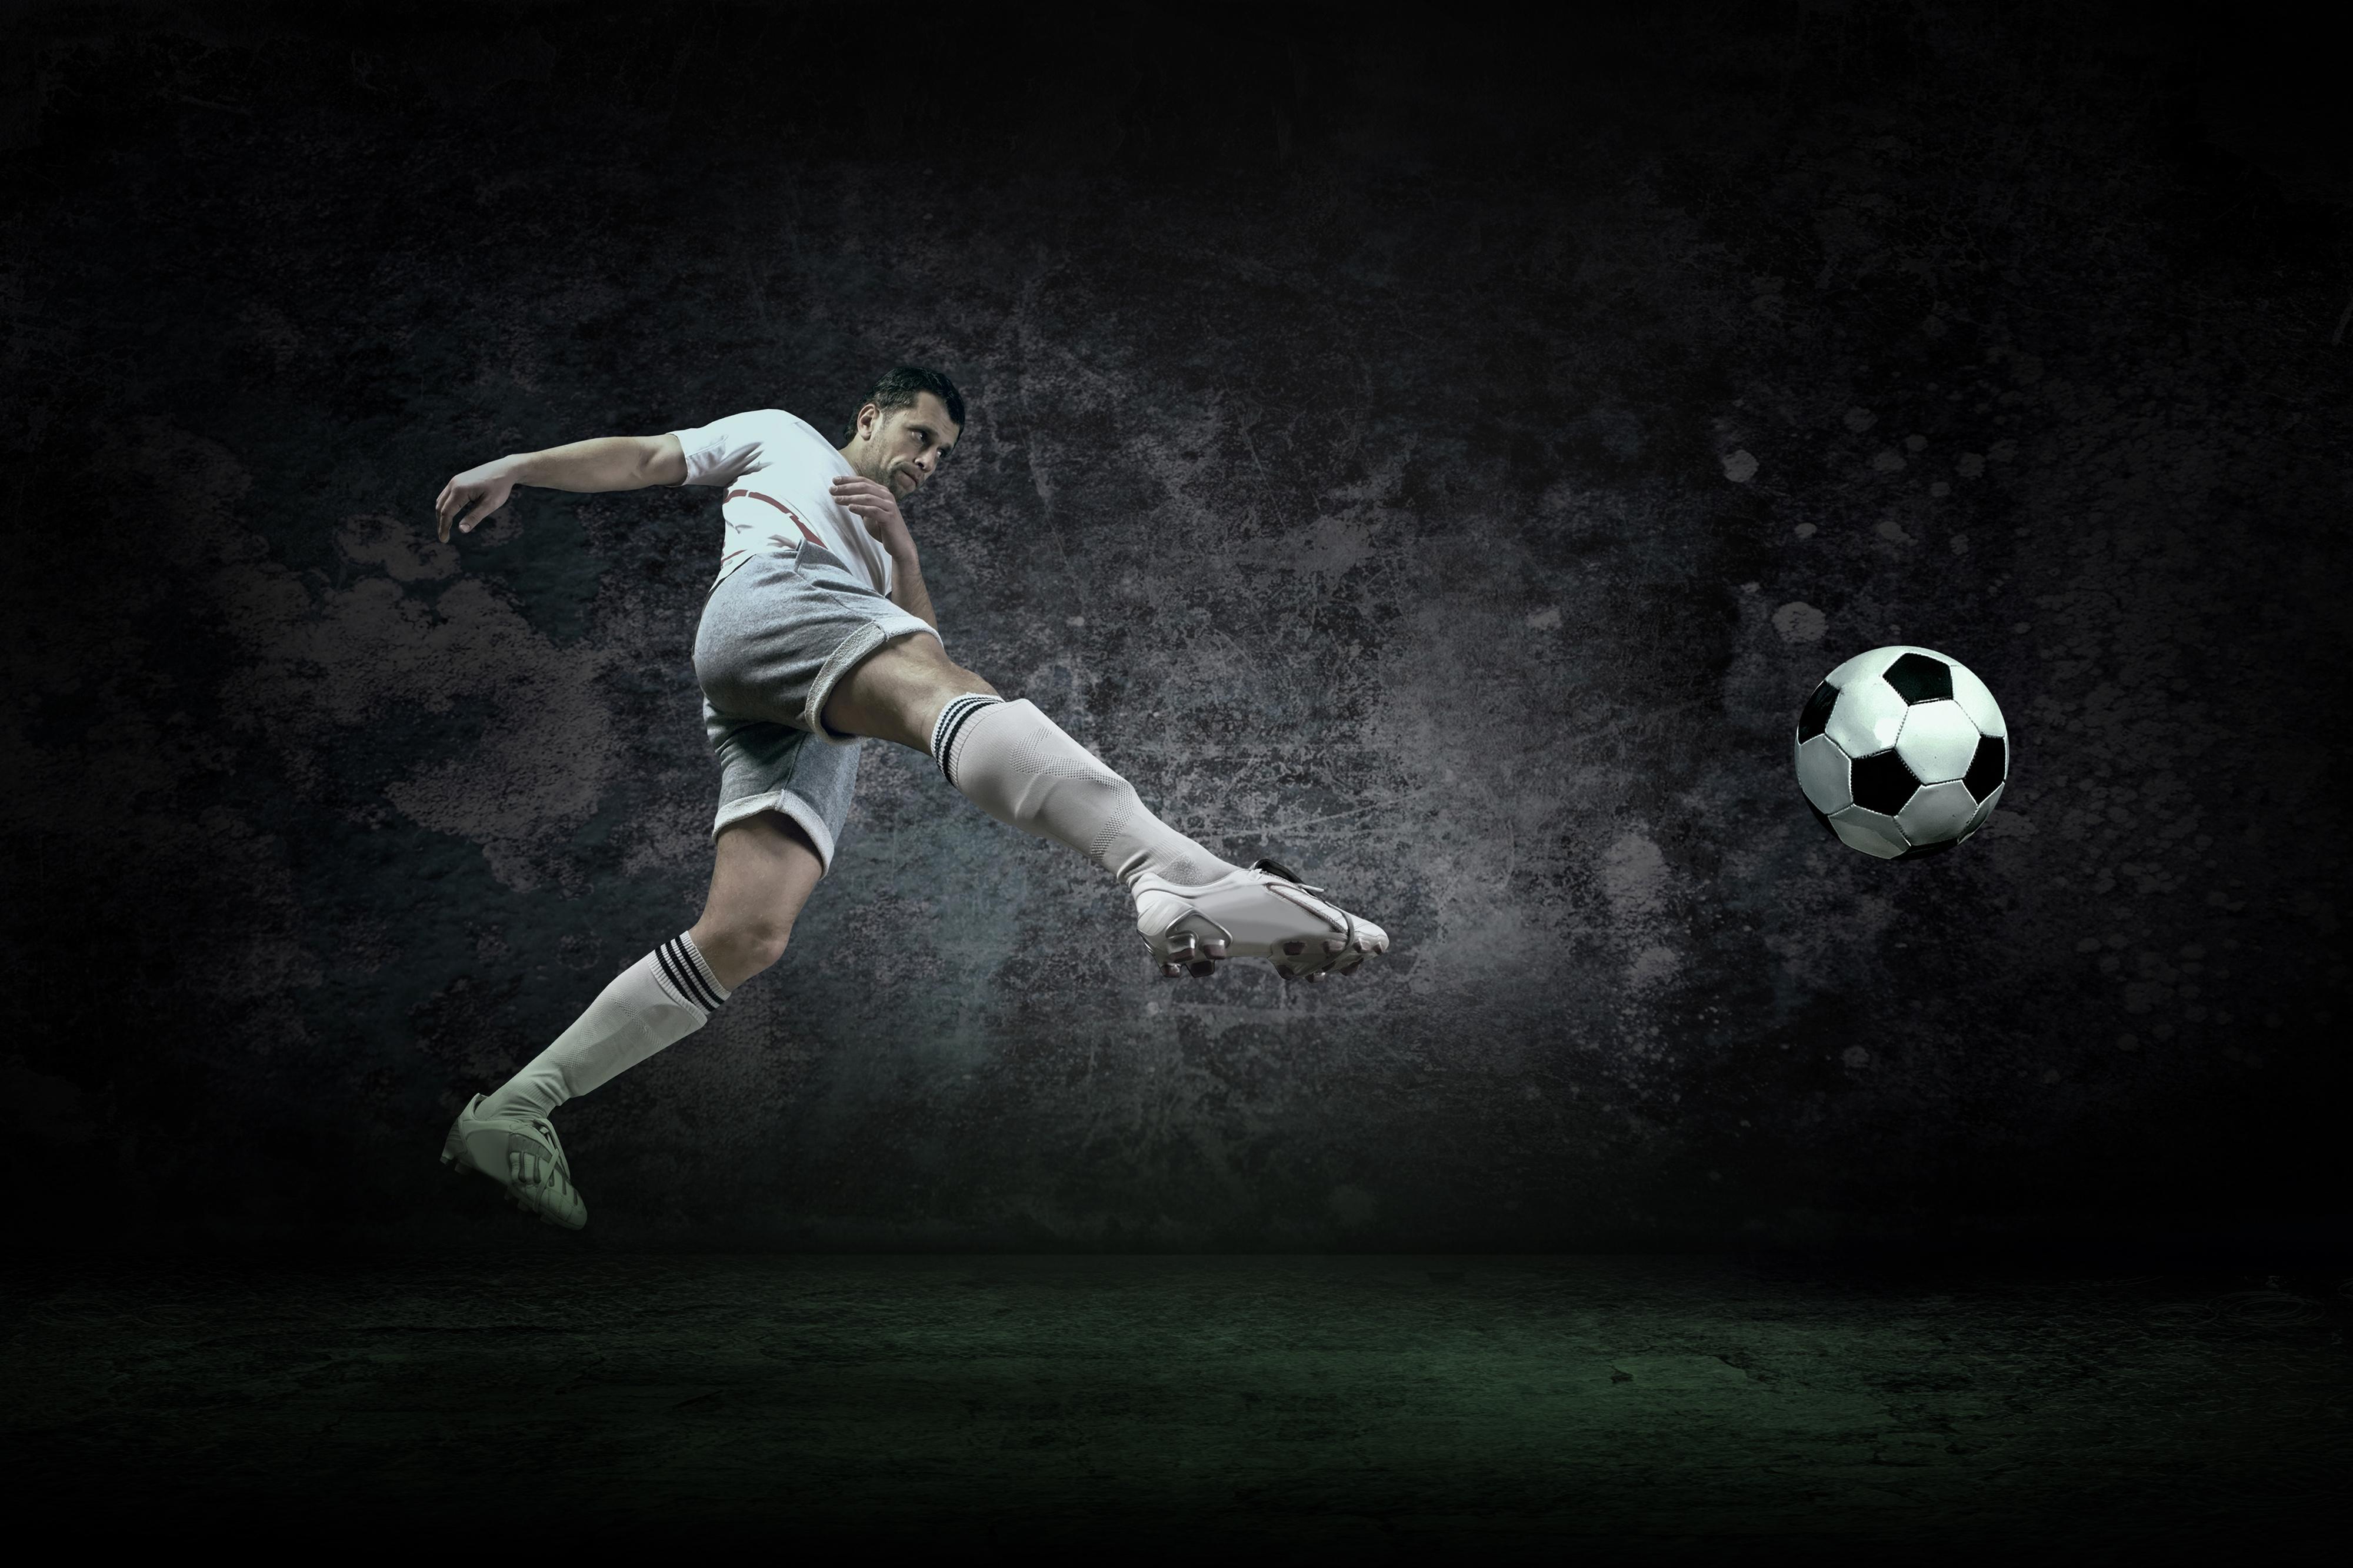 Splash of drops around football player under water